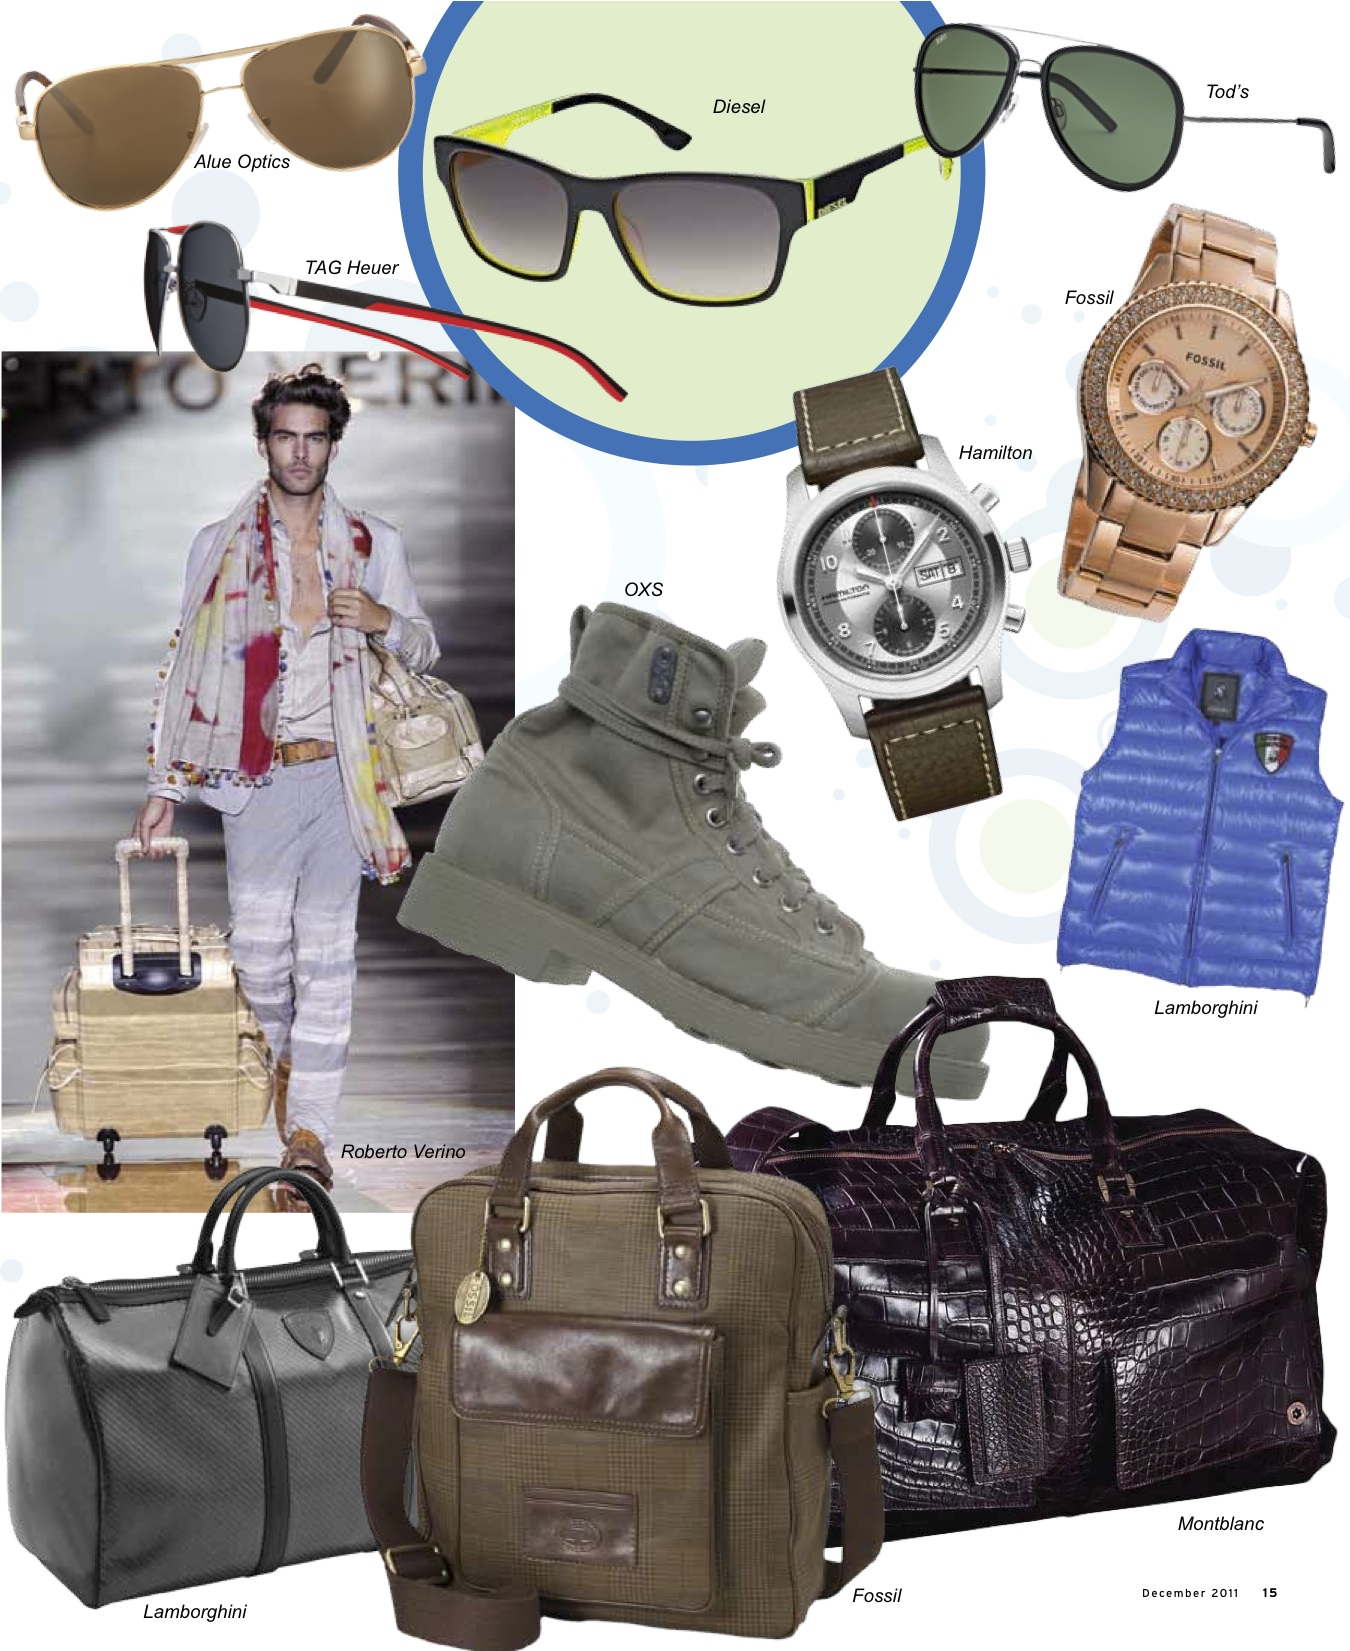 alue-optics-eight-sunglasses-Focus-on-Fashion-Retail-12-11